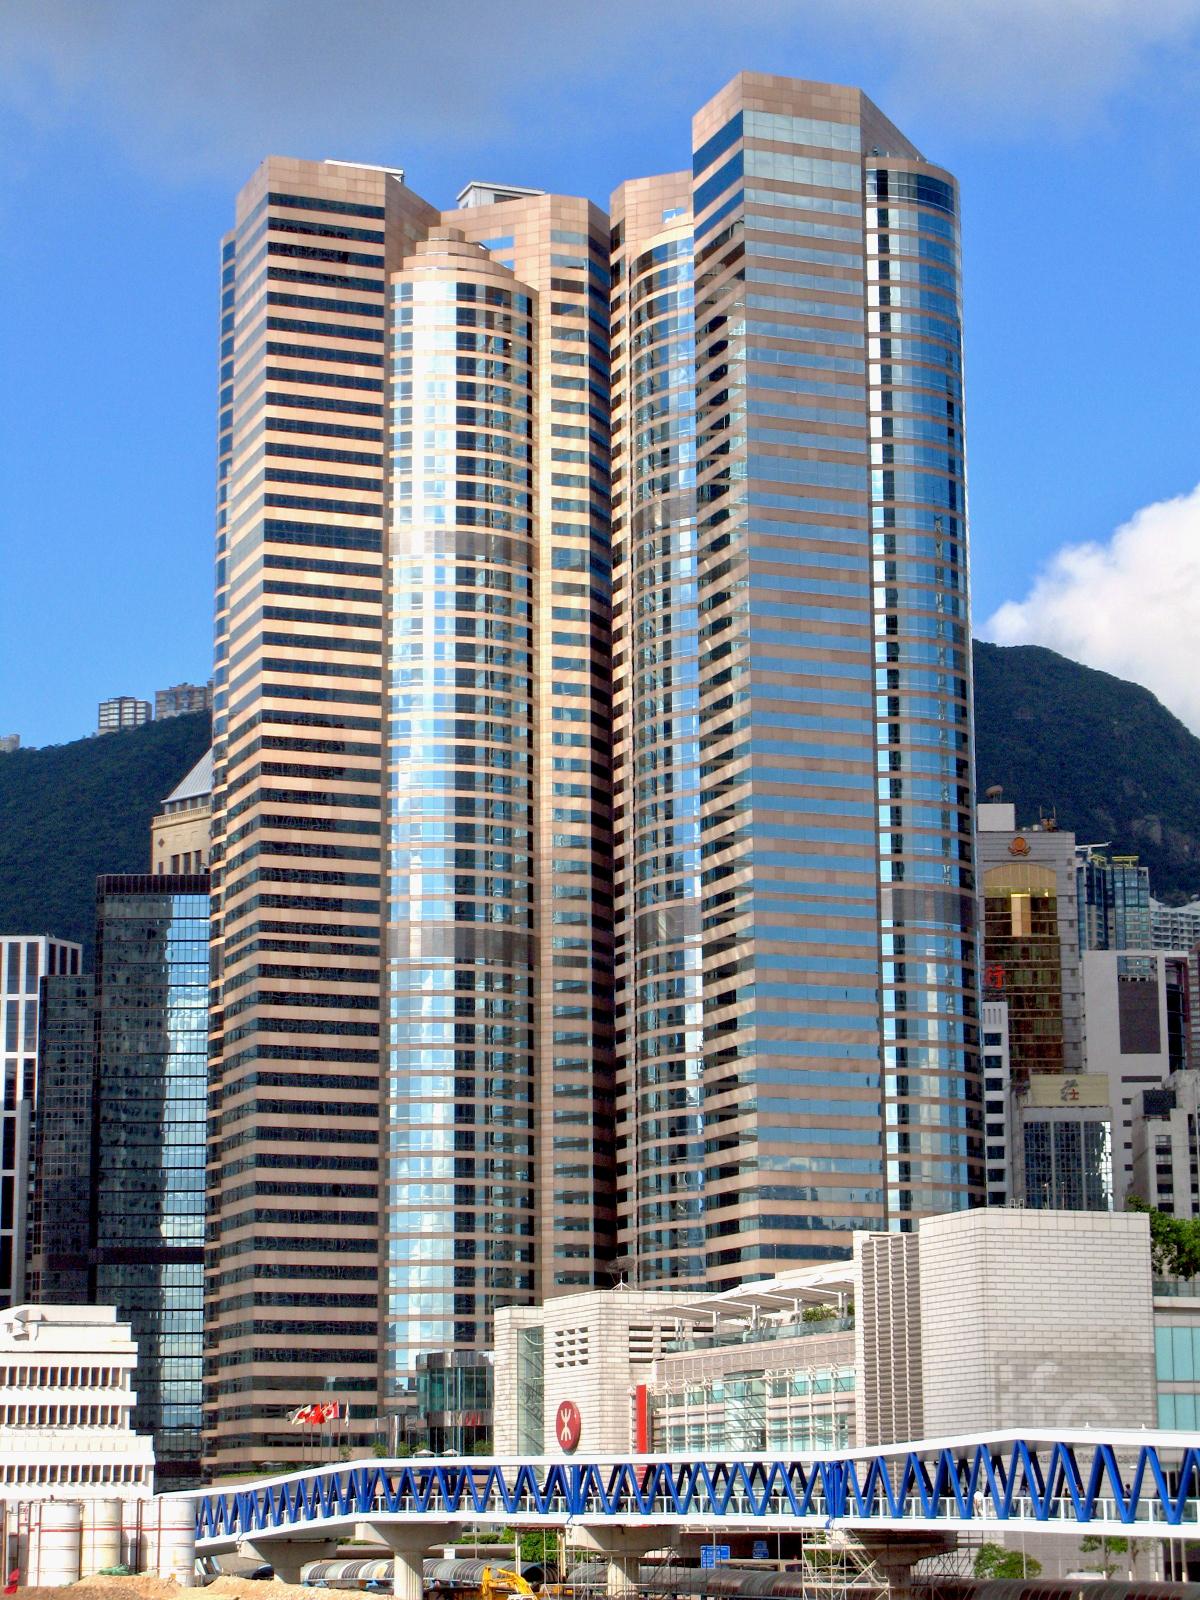 5. Principales bolsas del mundo: Bolsa de Hong Kong